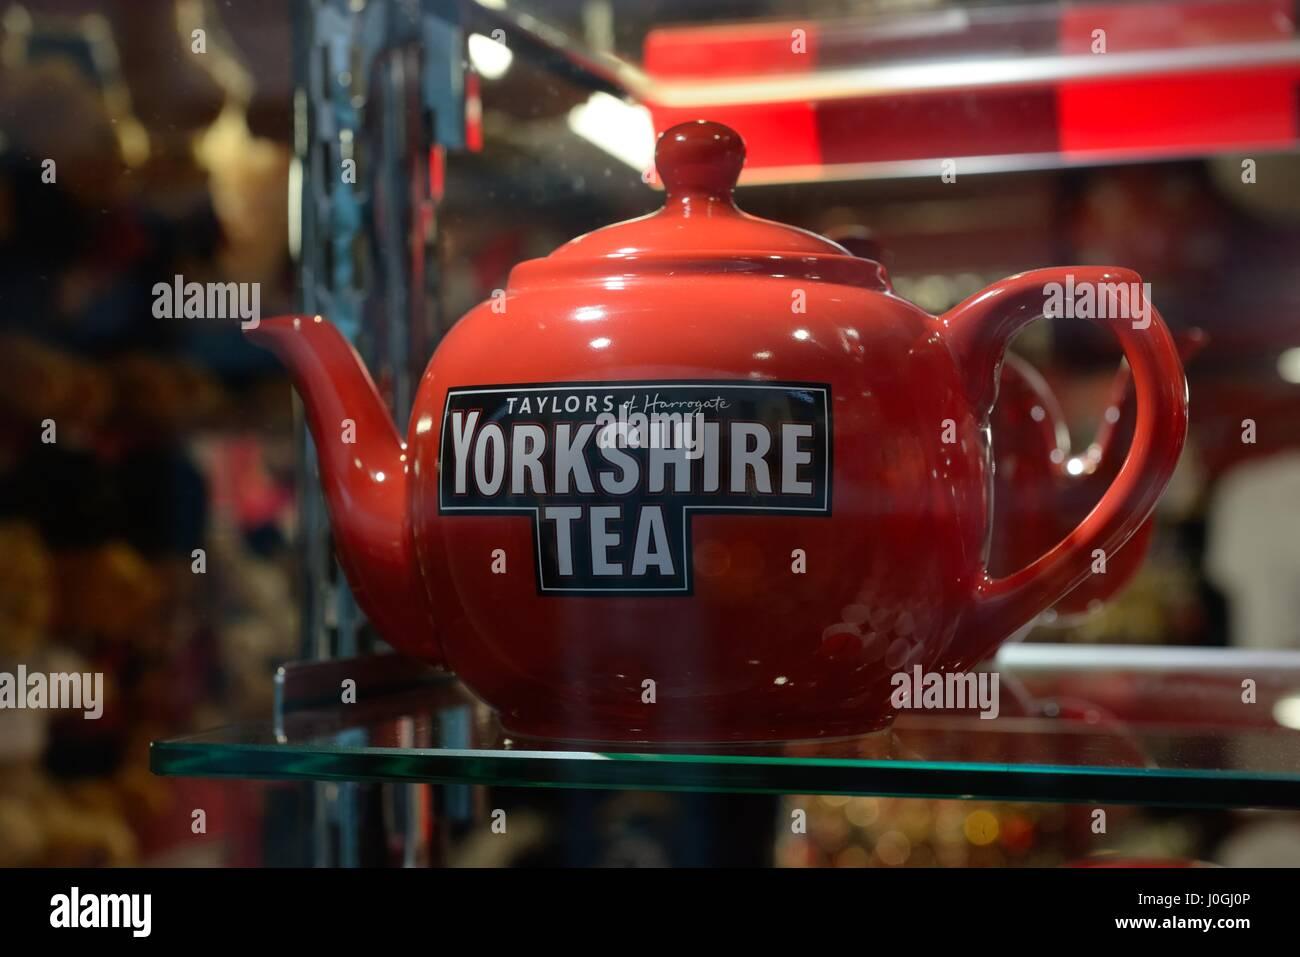 Red 'Taylor's of Harrogate' Yorkshire Tea pot on a shop shelf. - Stock Image